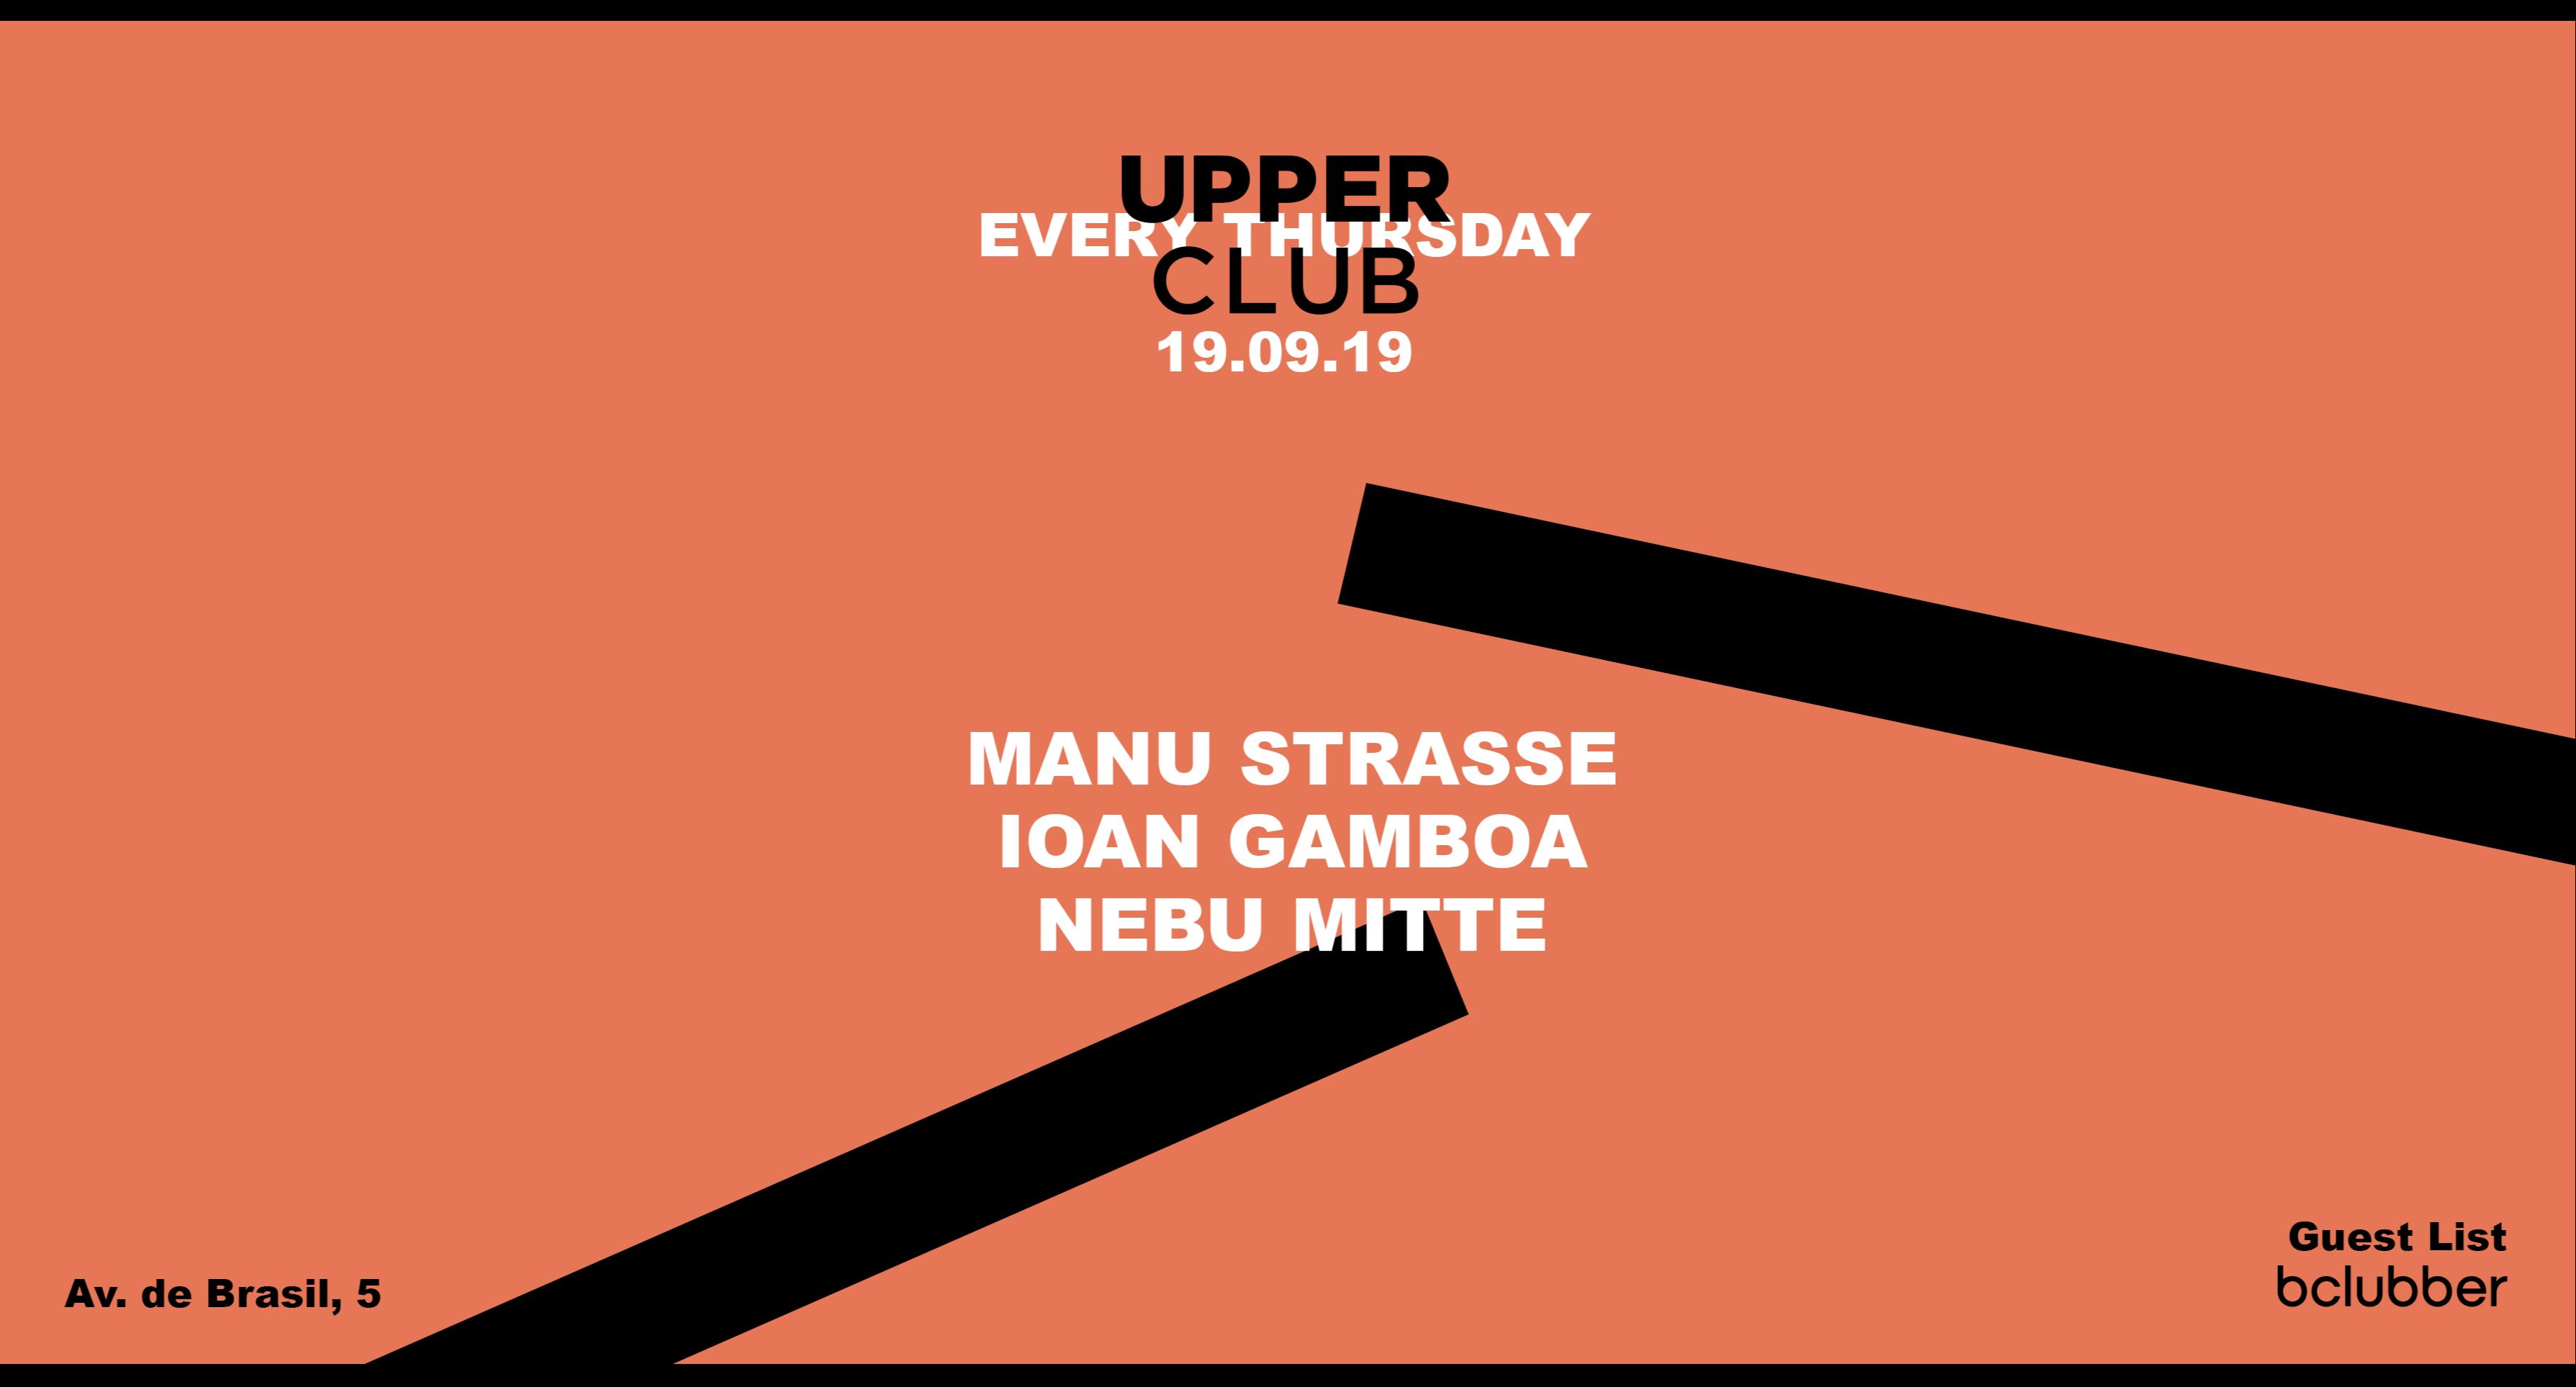 Ioan Gamboa, Manu Strasse & Nebu Mitte @ Upper Club | Madrid | Comunidad de Madrid | España